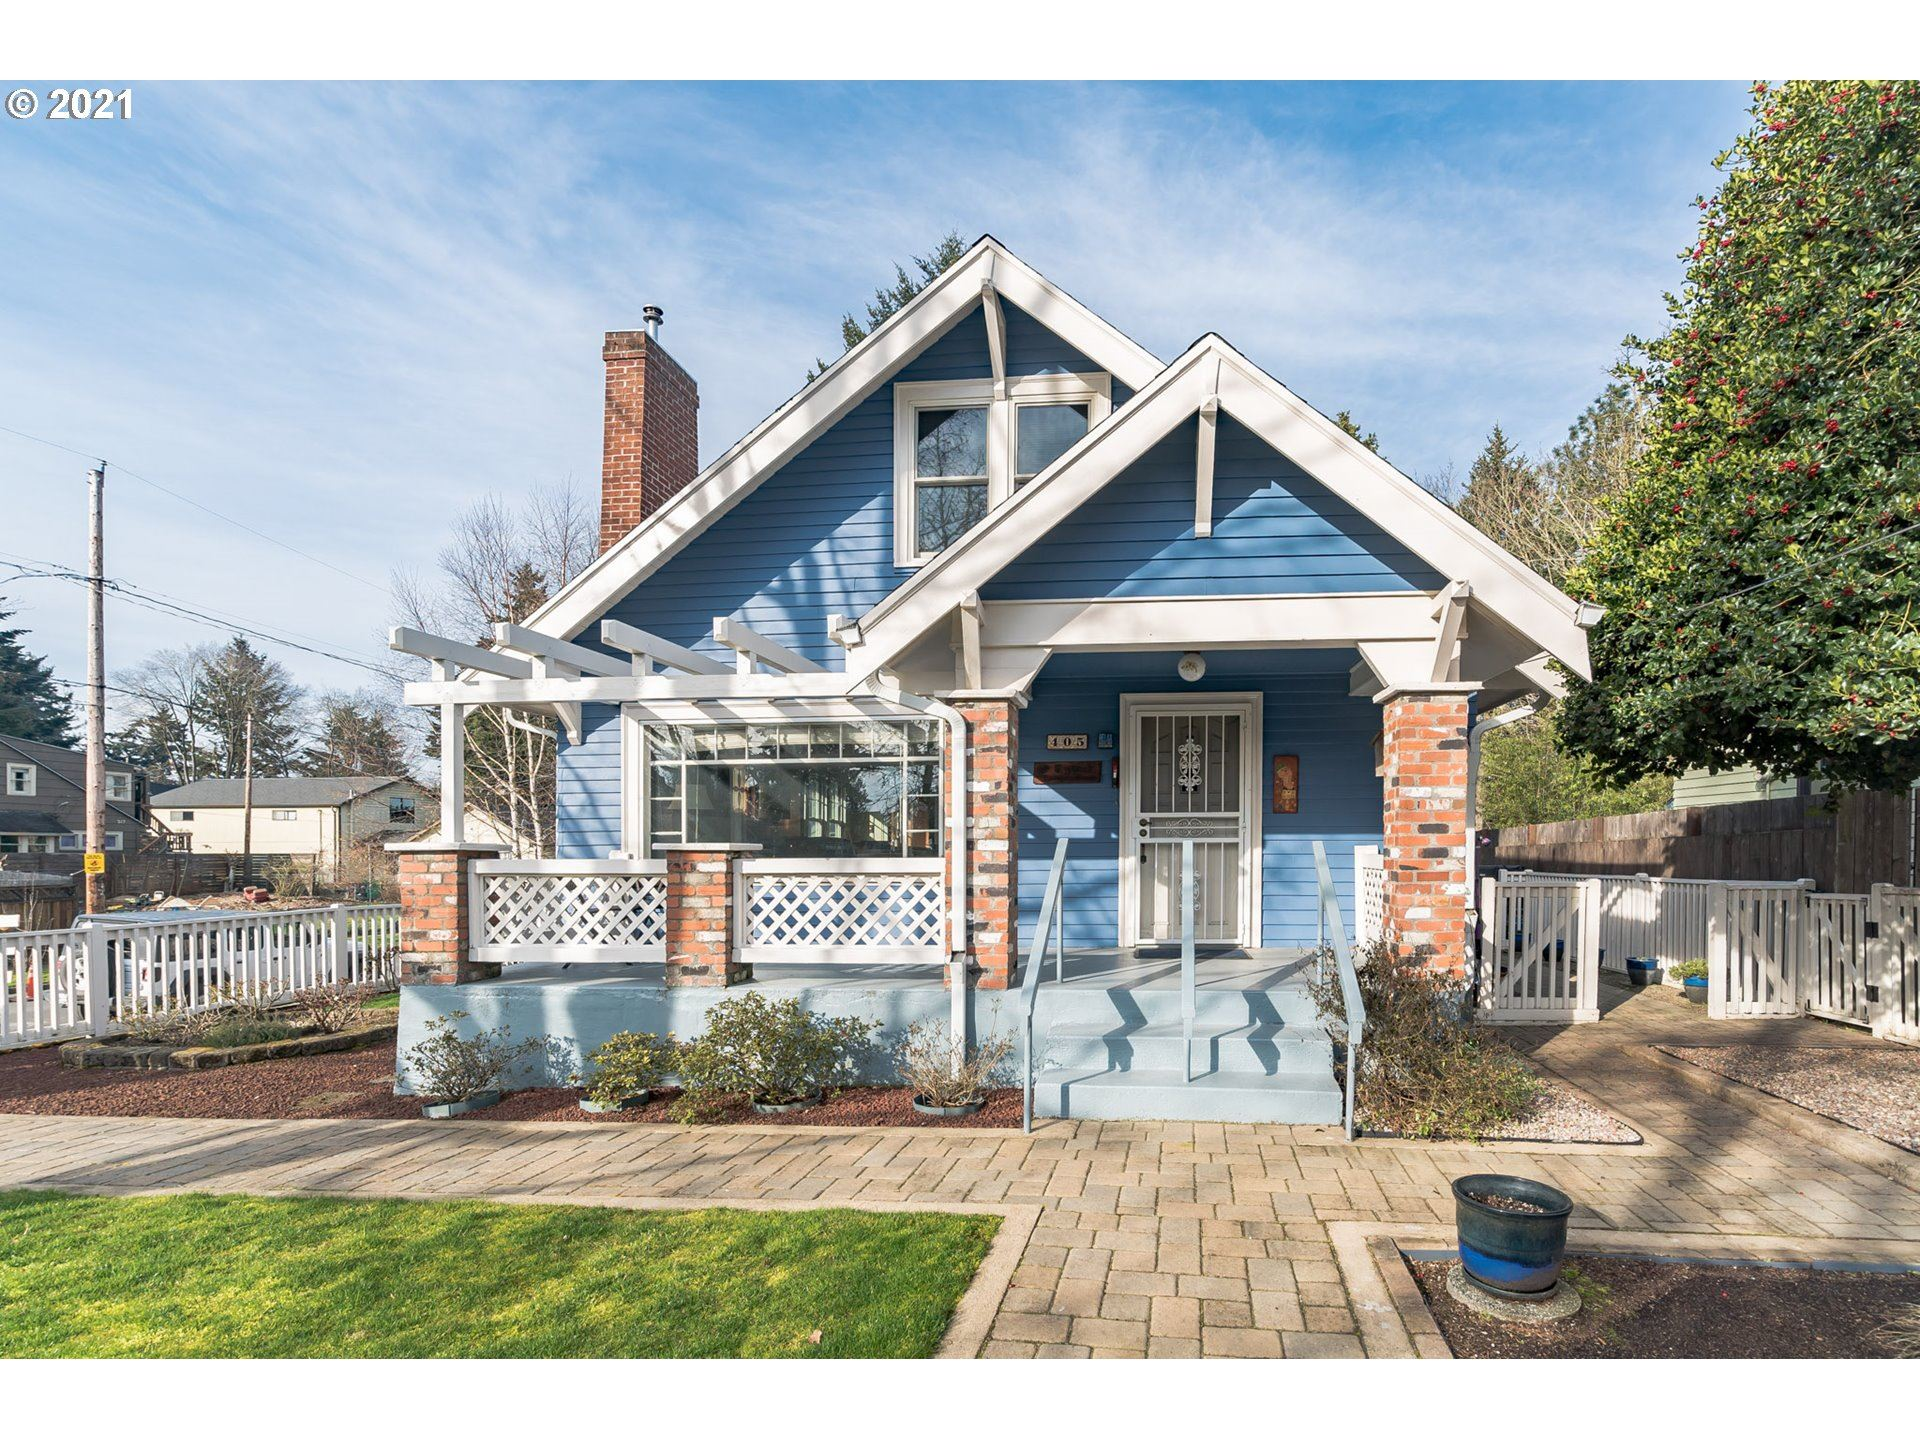 405 NE 66TH AVE, Portland, OR 97213 - MLS#: 21574522